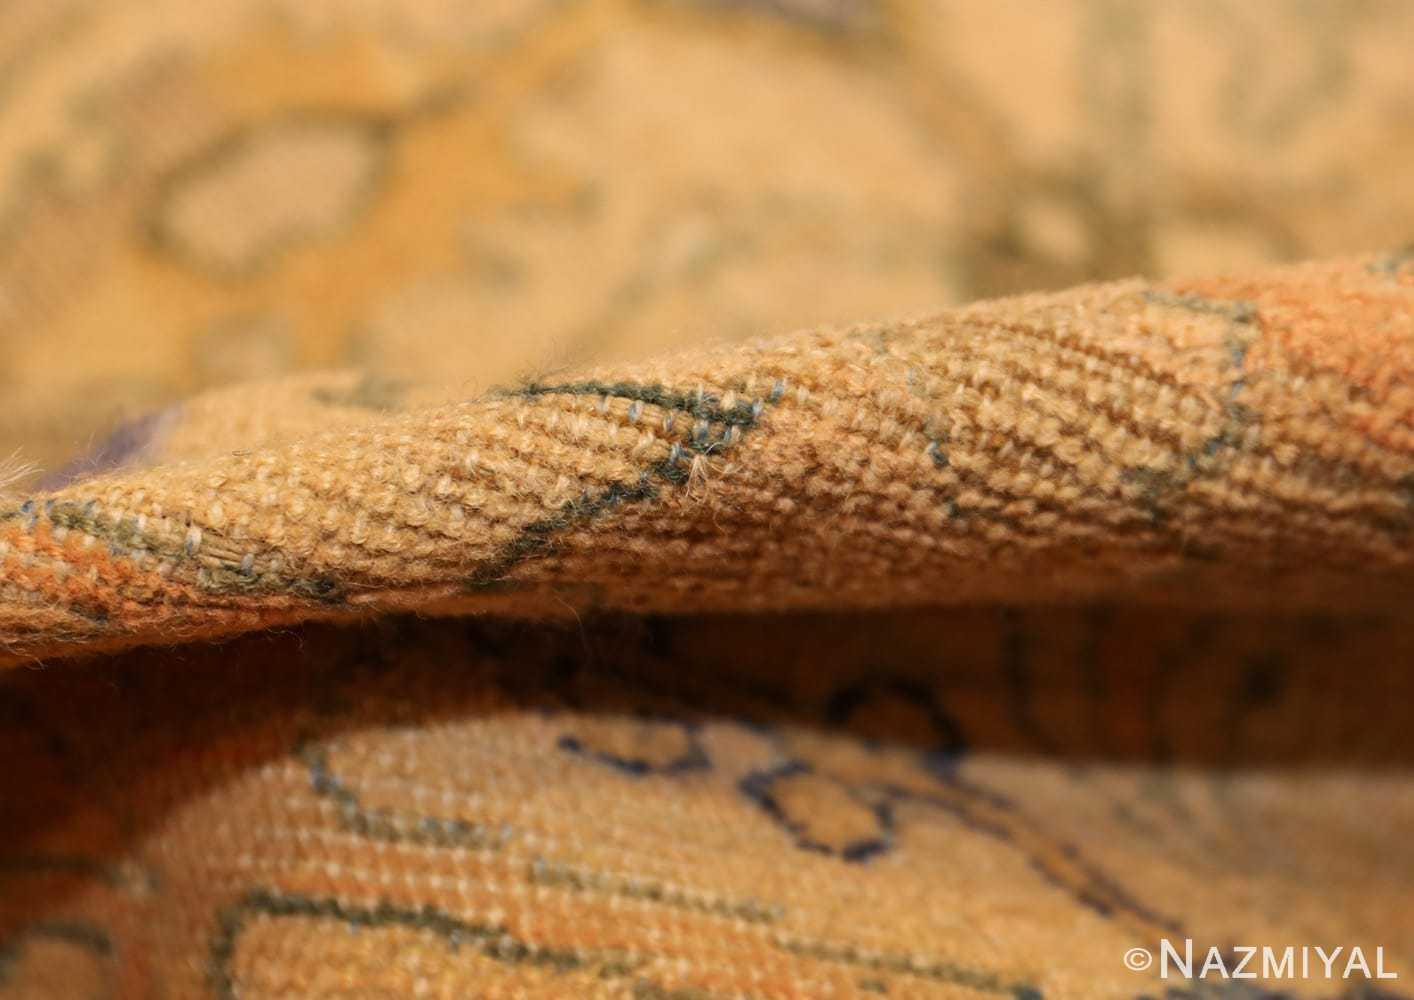 17th century cuenca spanish rug 49270 pile Nazmiyal